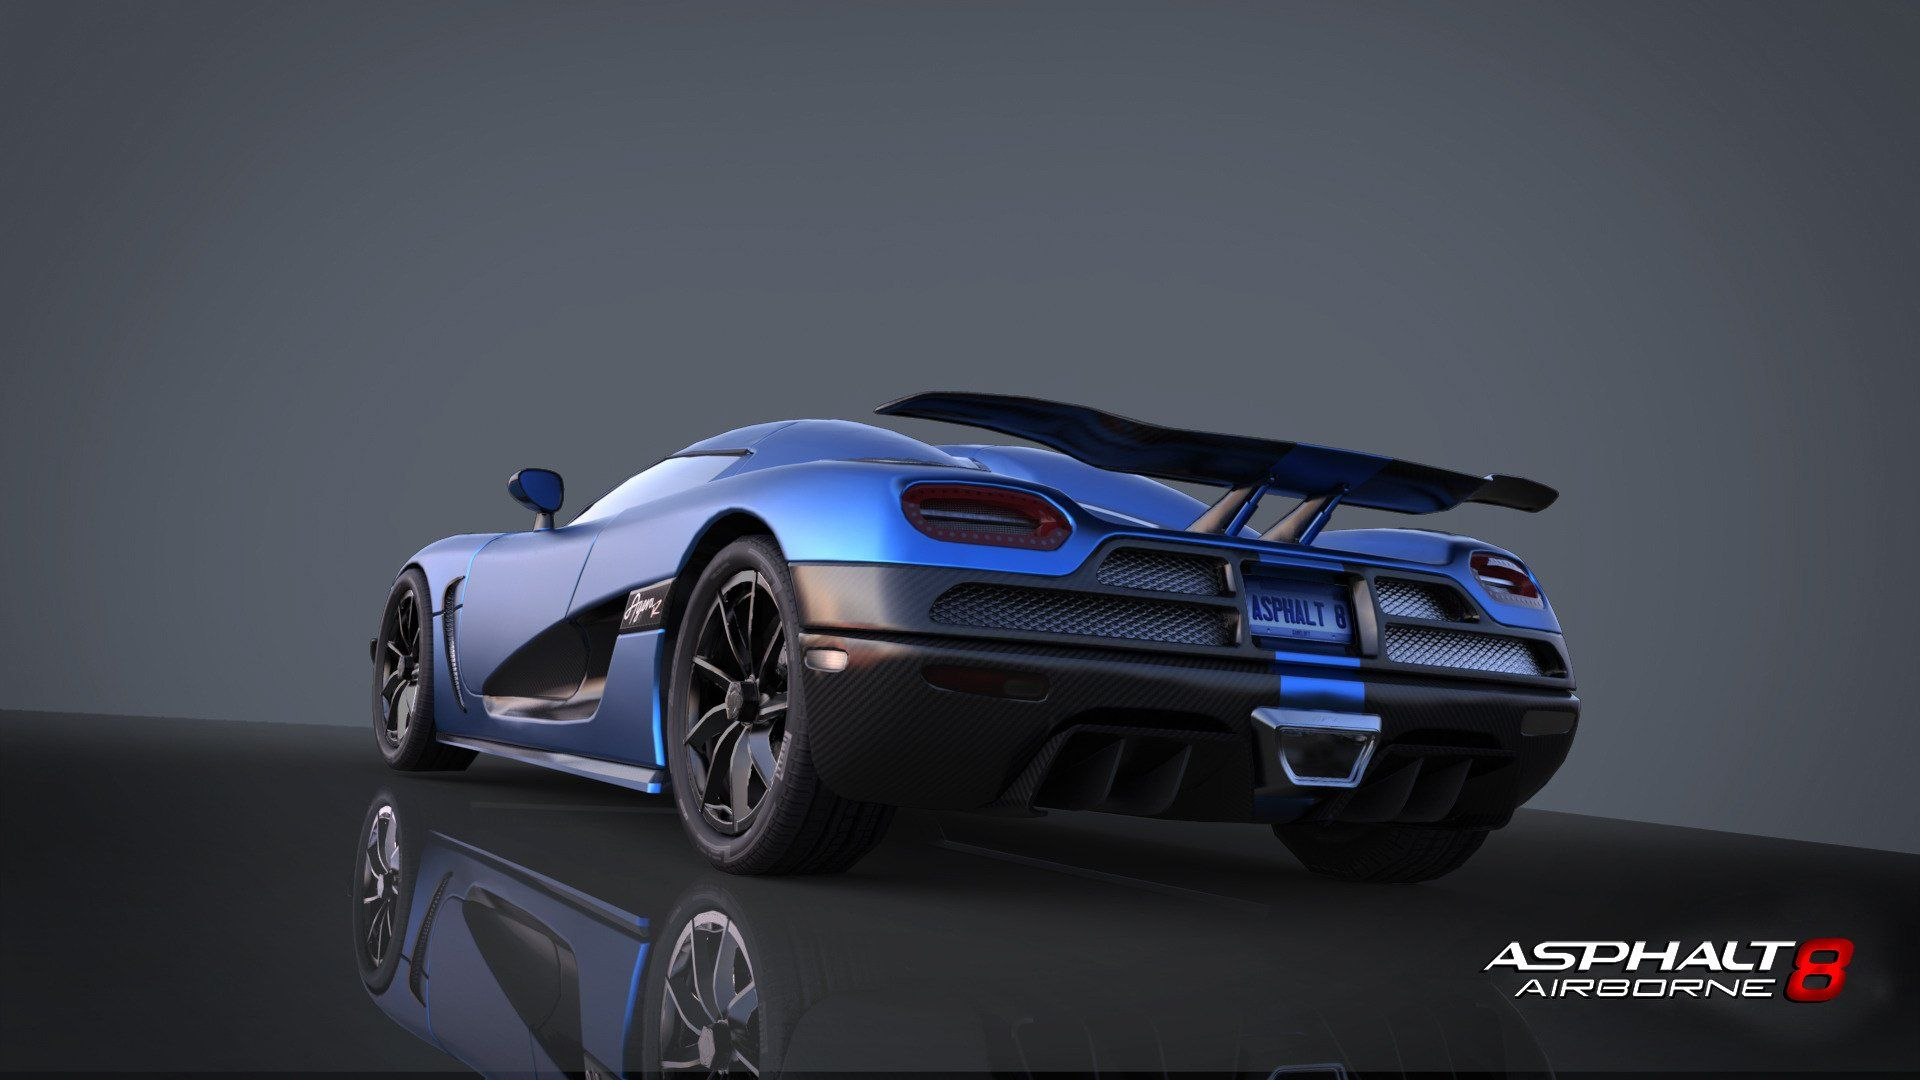 2d3b5bb30f2bb3ba1a4166c9fc85399e Marvelous Lamborghini Huracan Hack asphalt 8 Cars Trend